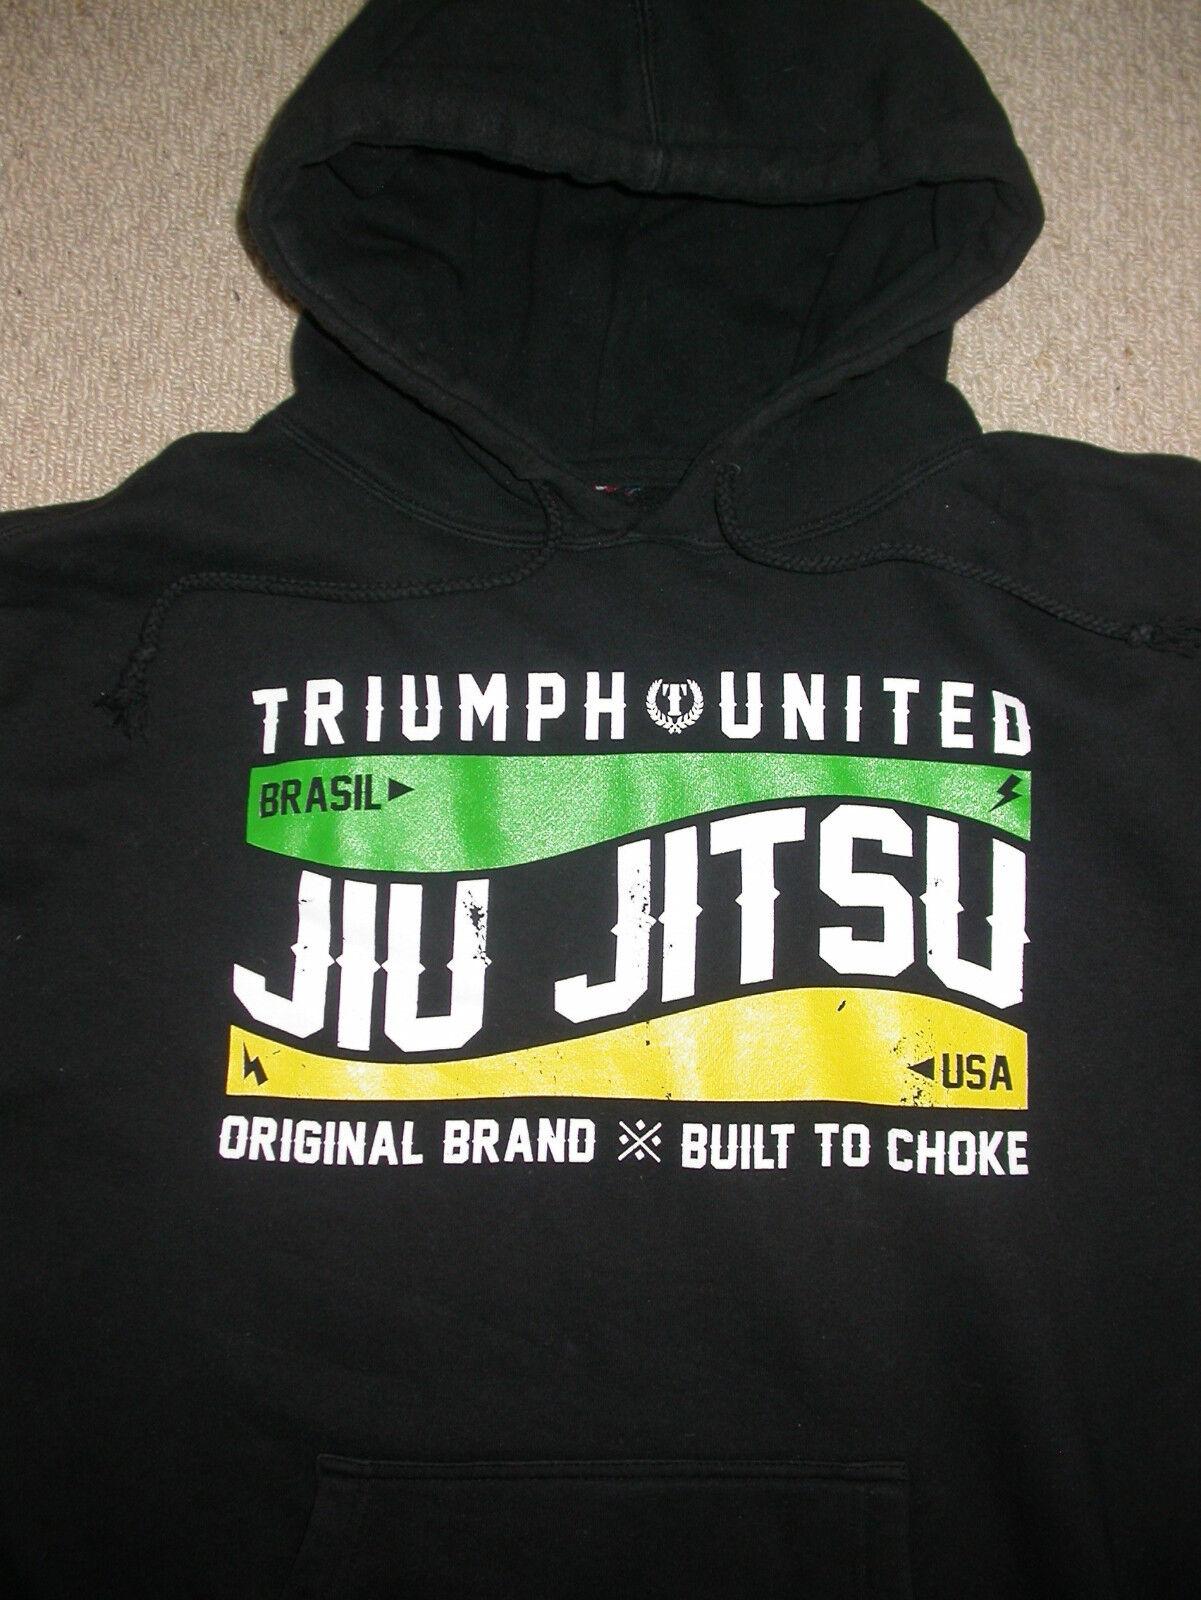 TRIUMPH UNITED HOODY HOODED SWEATSHIRT XL EXTRA LARGE  UFC MMA BJJ JIU JITSU GYM